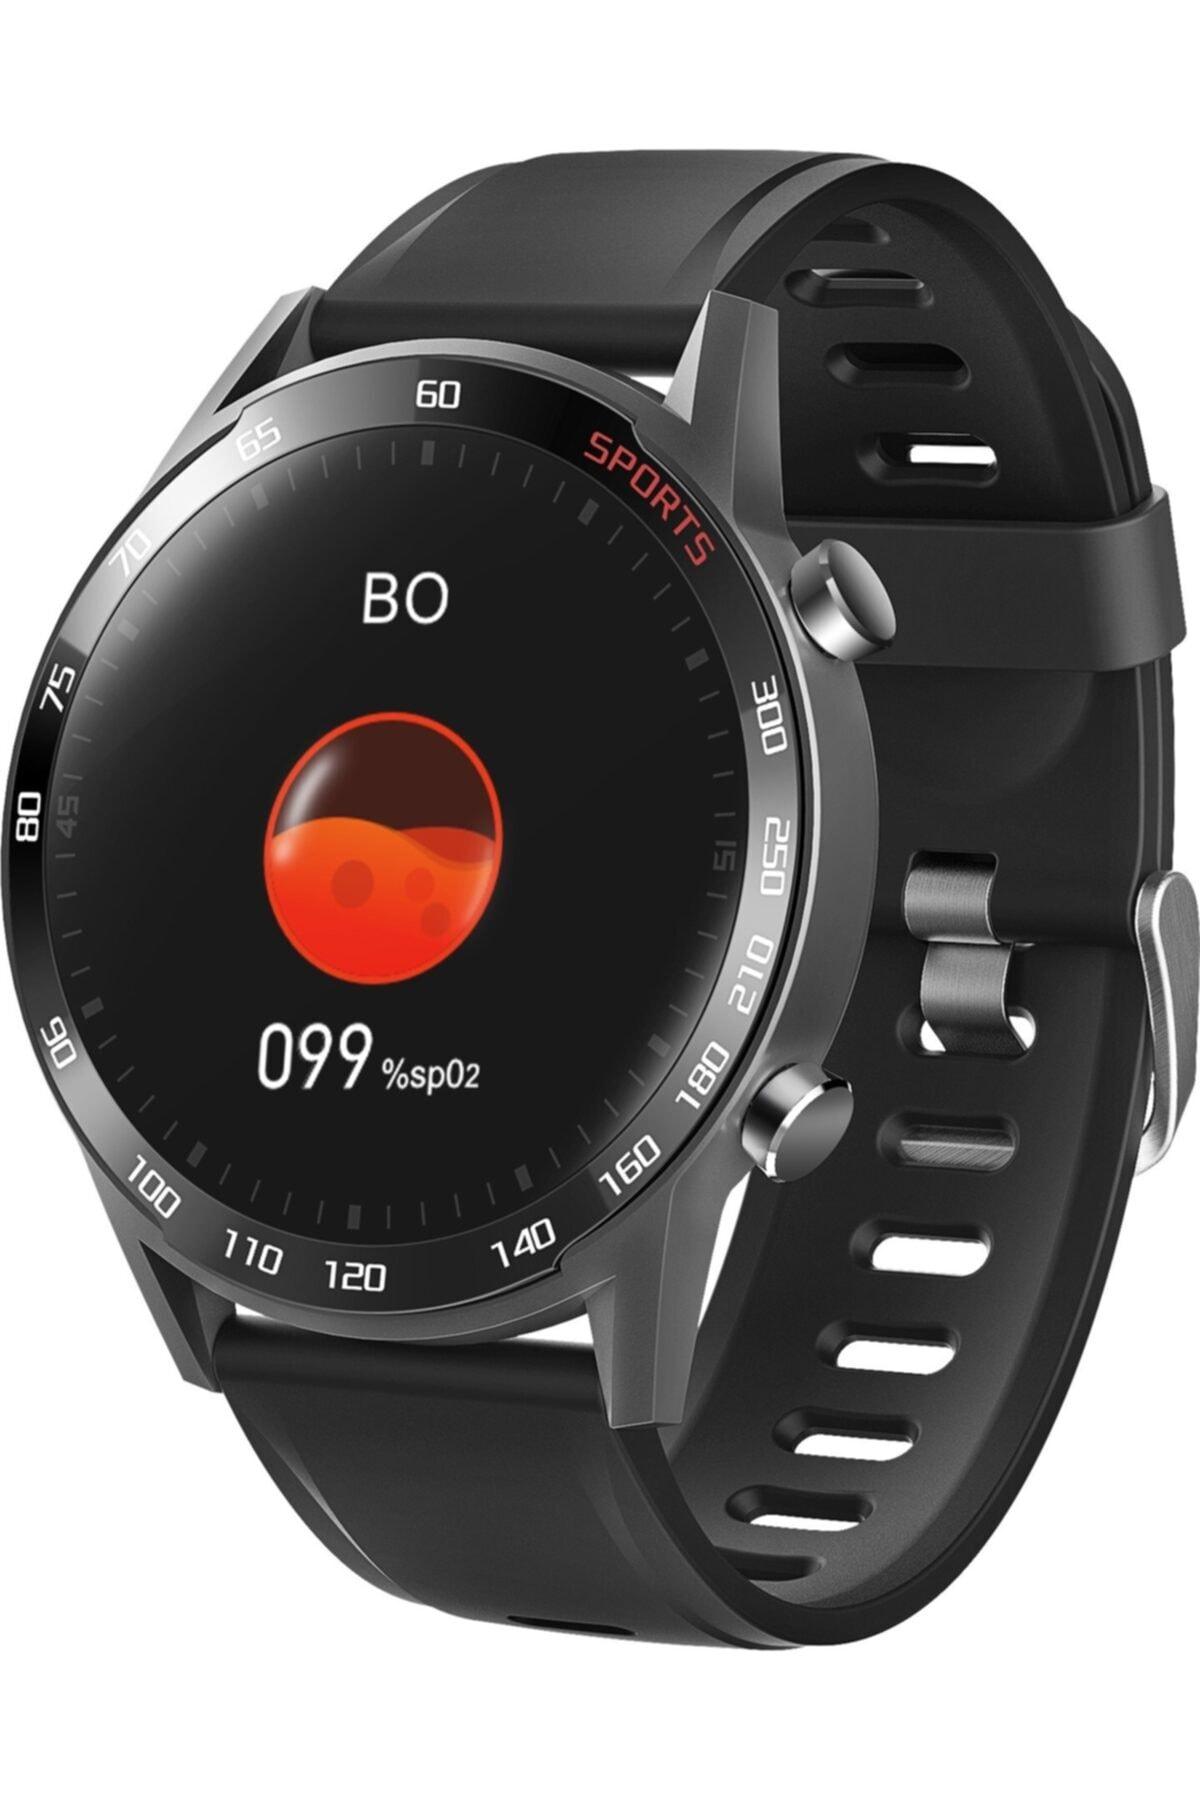 ZCWATCH ZC-V33T Unisex Ultra Akıllı Saat, Ateş Ölçer